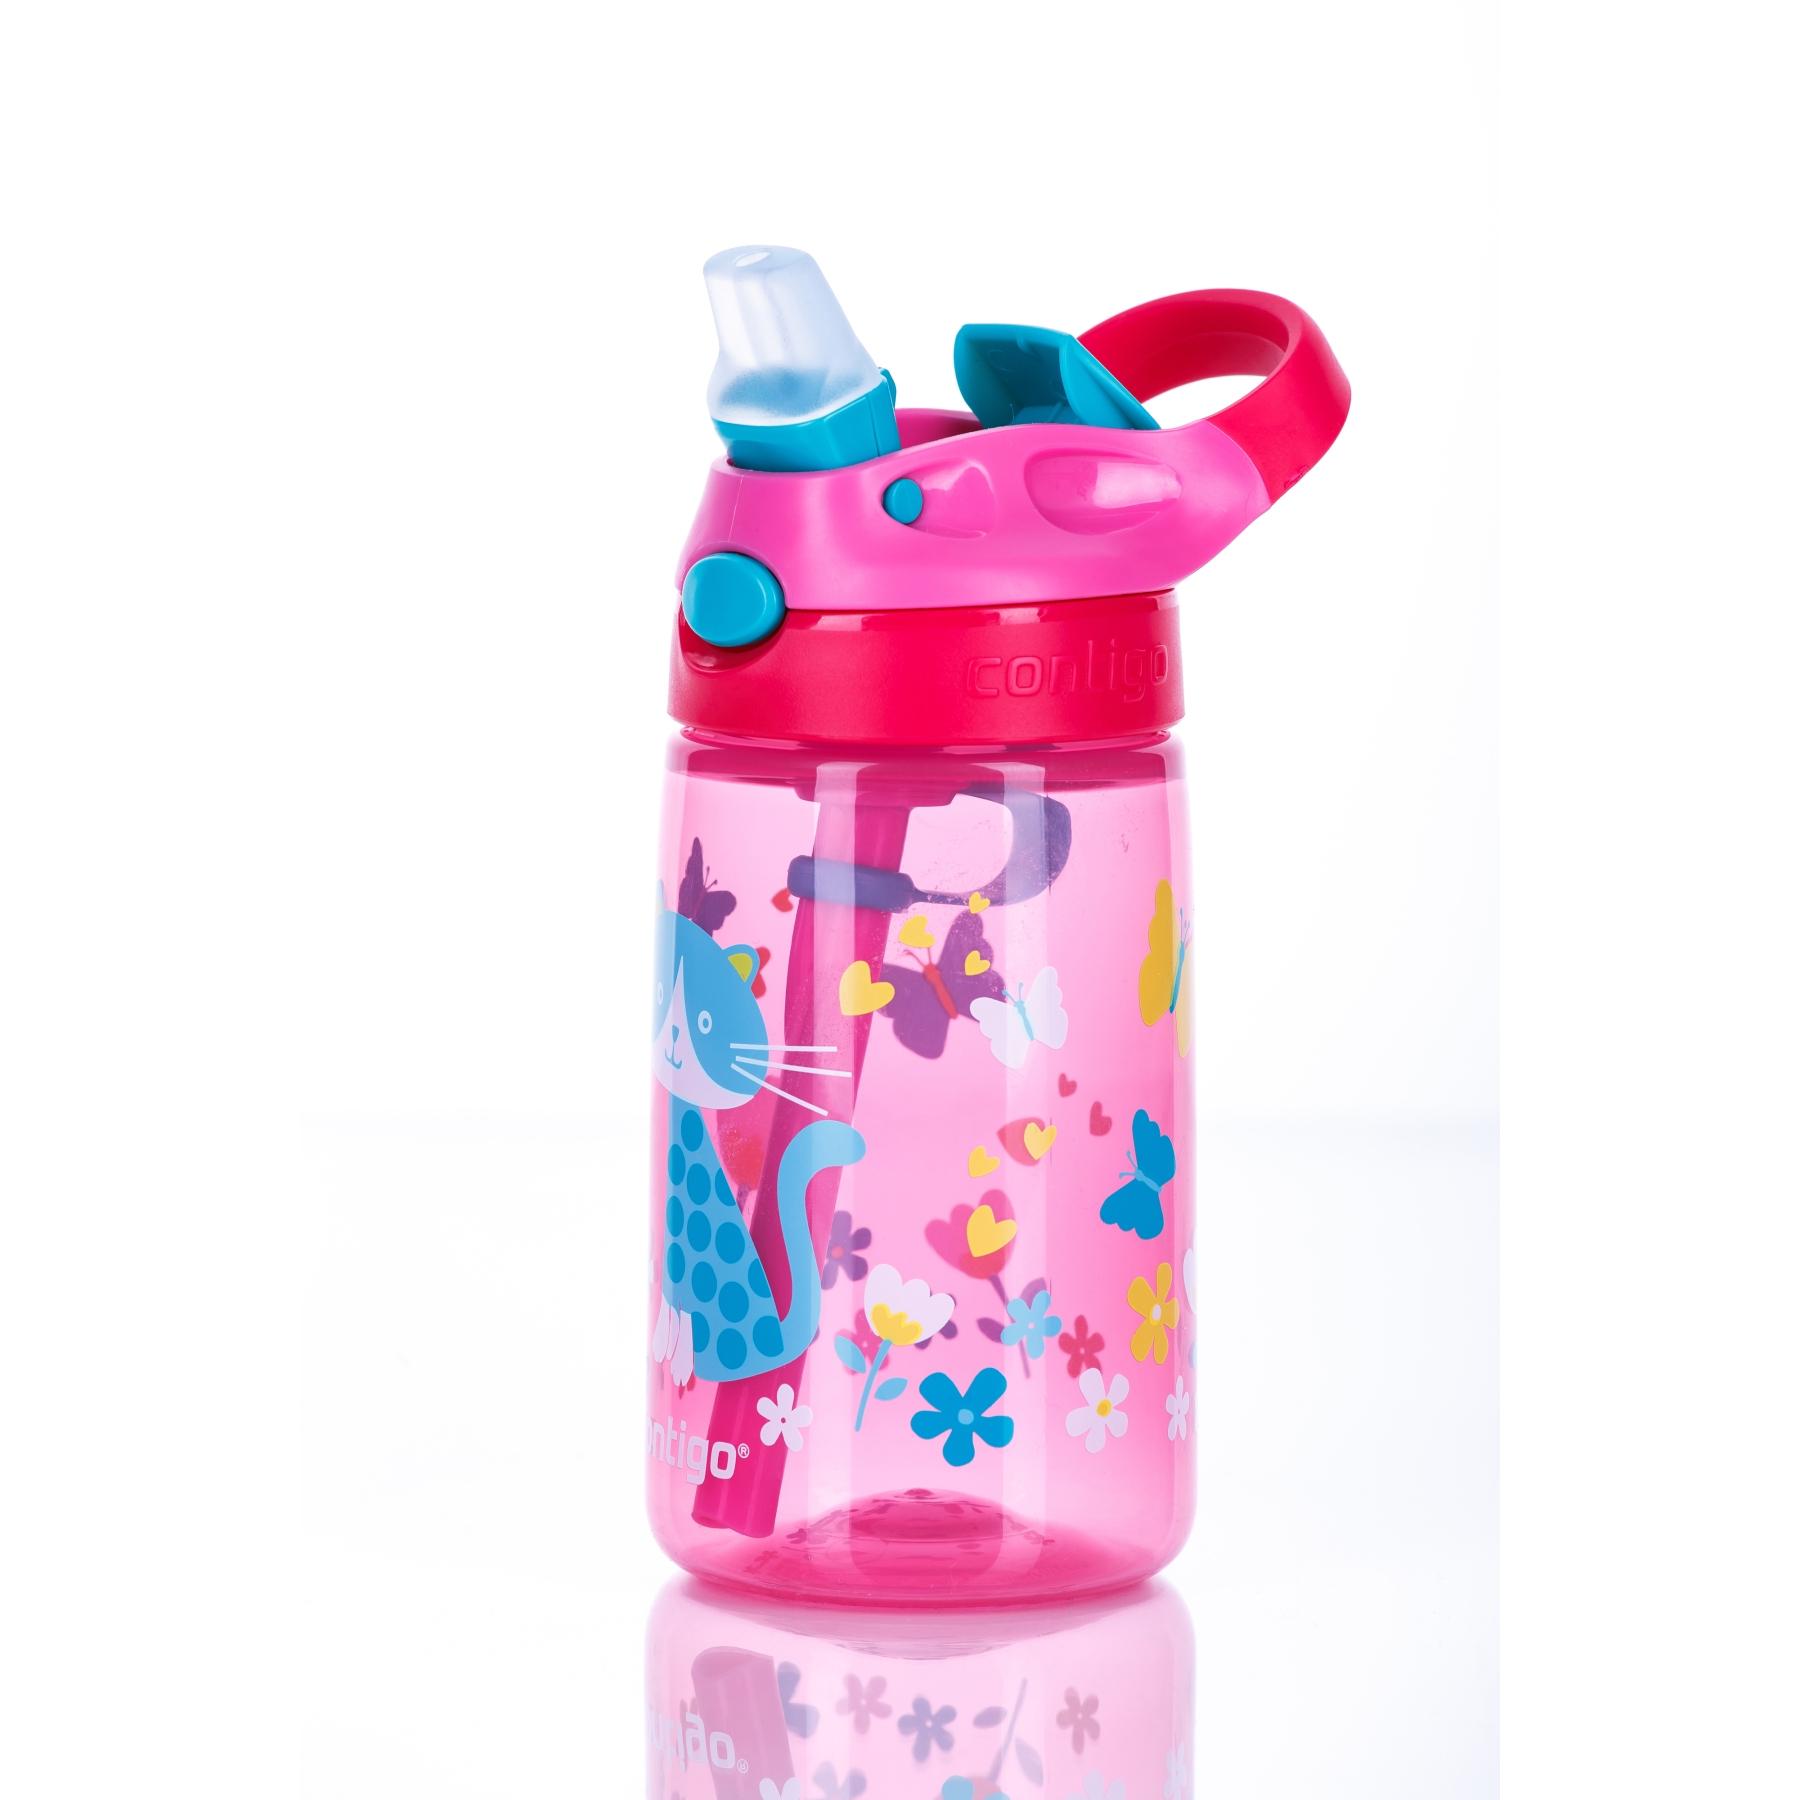 Contigo Gizmo Flip Water Bottle 420ml - cherry with cat